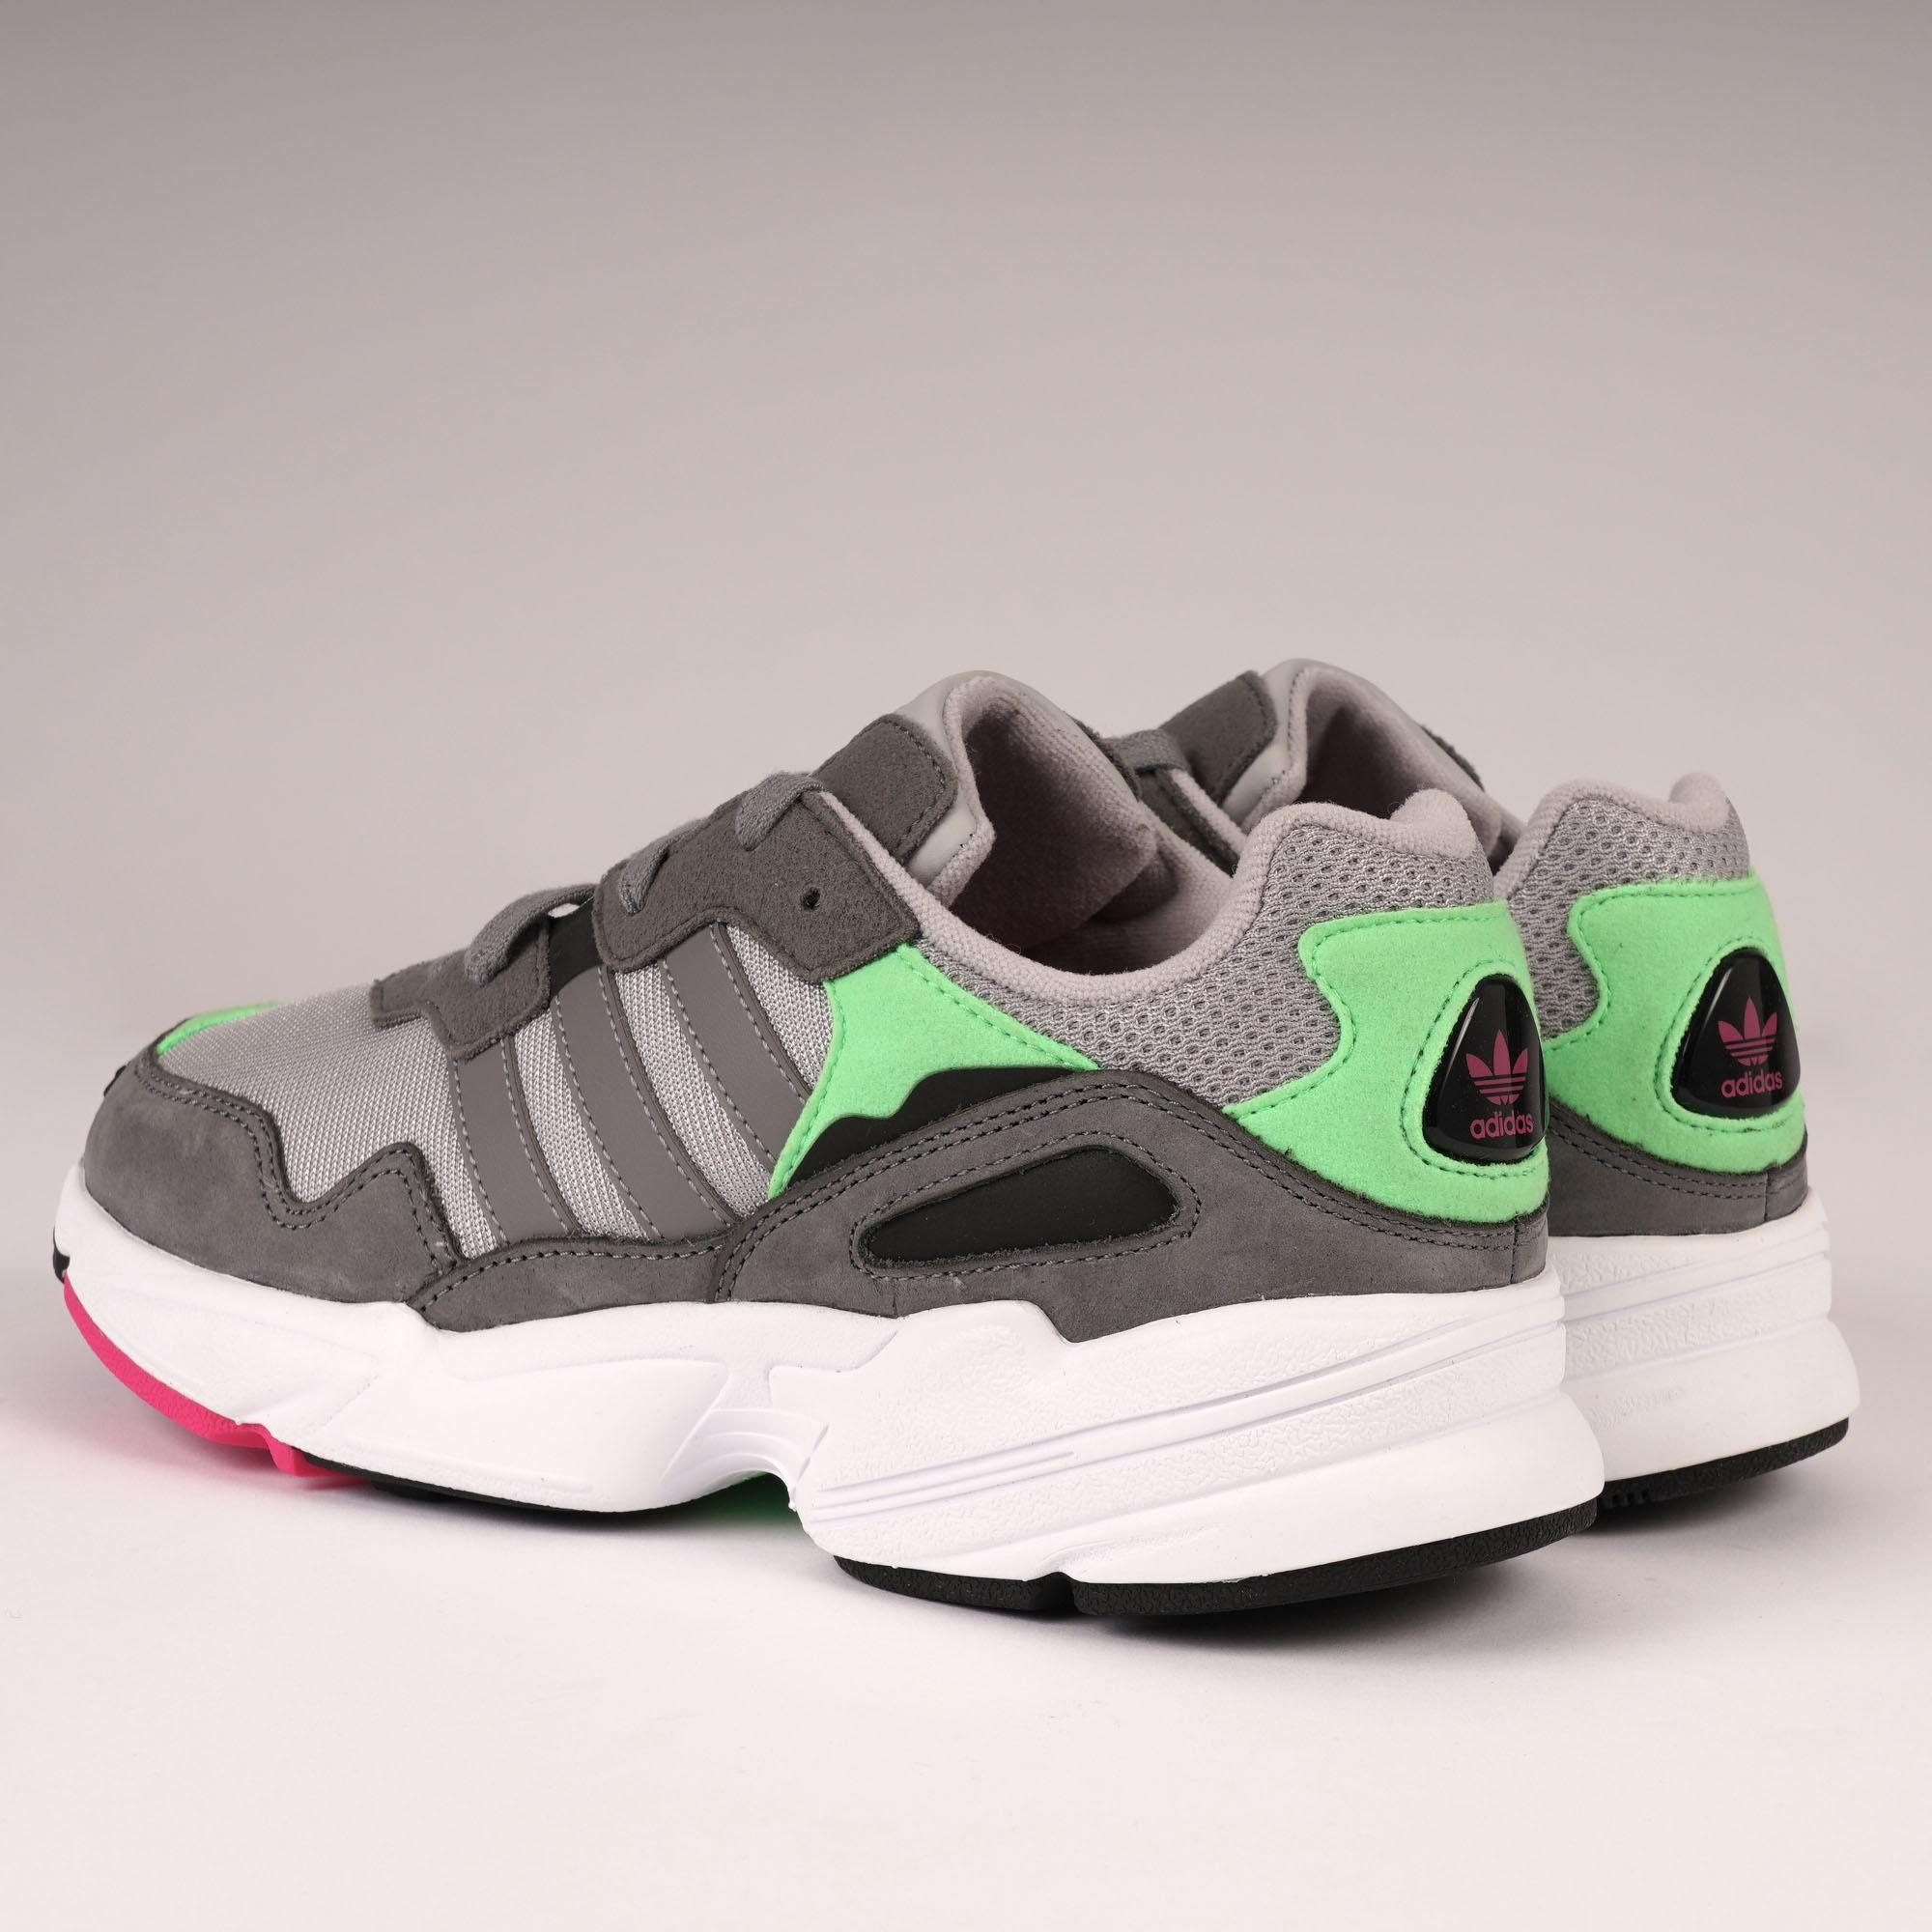 411db2885bdf21 Adidas Originals - Gray Yung-96 - Grey Two